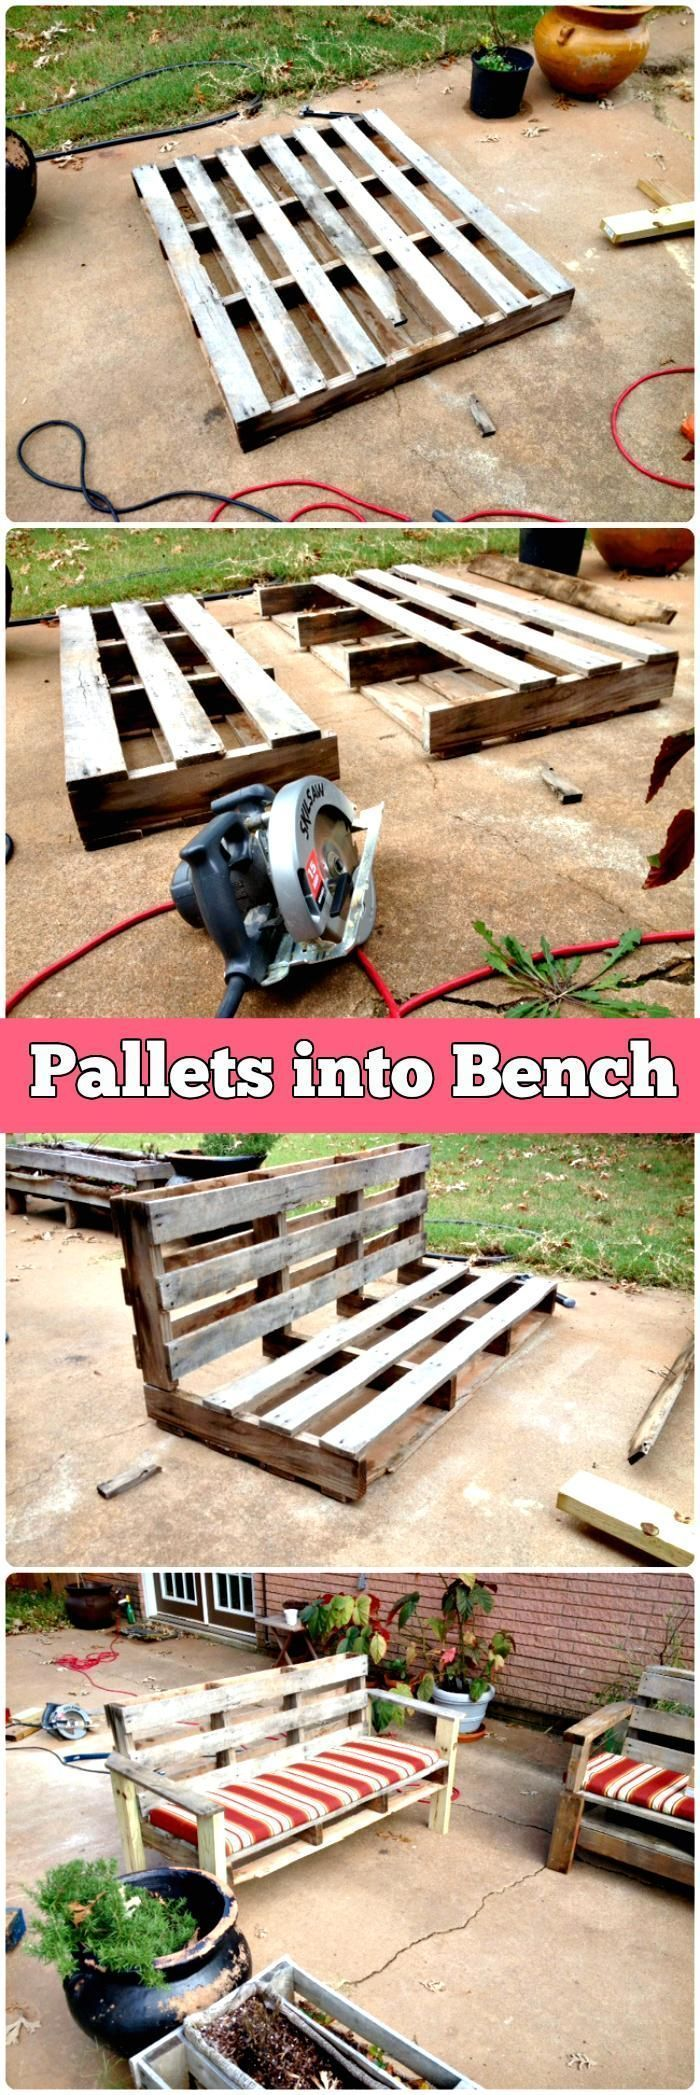 5 Easy Step DIY Transformation - Palette in Patio-Bank im Freien - 150 Best DI ..., #Bench #D ...#bench #diy #easy #freien #palette #patiobank #step #transformation